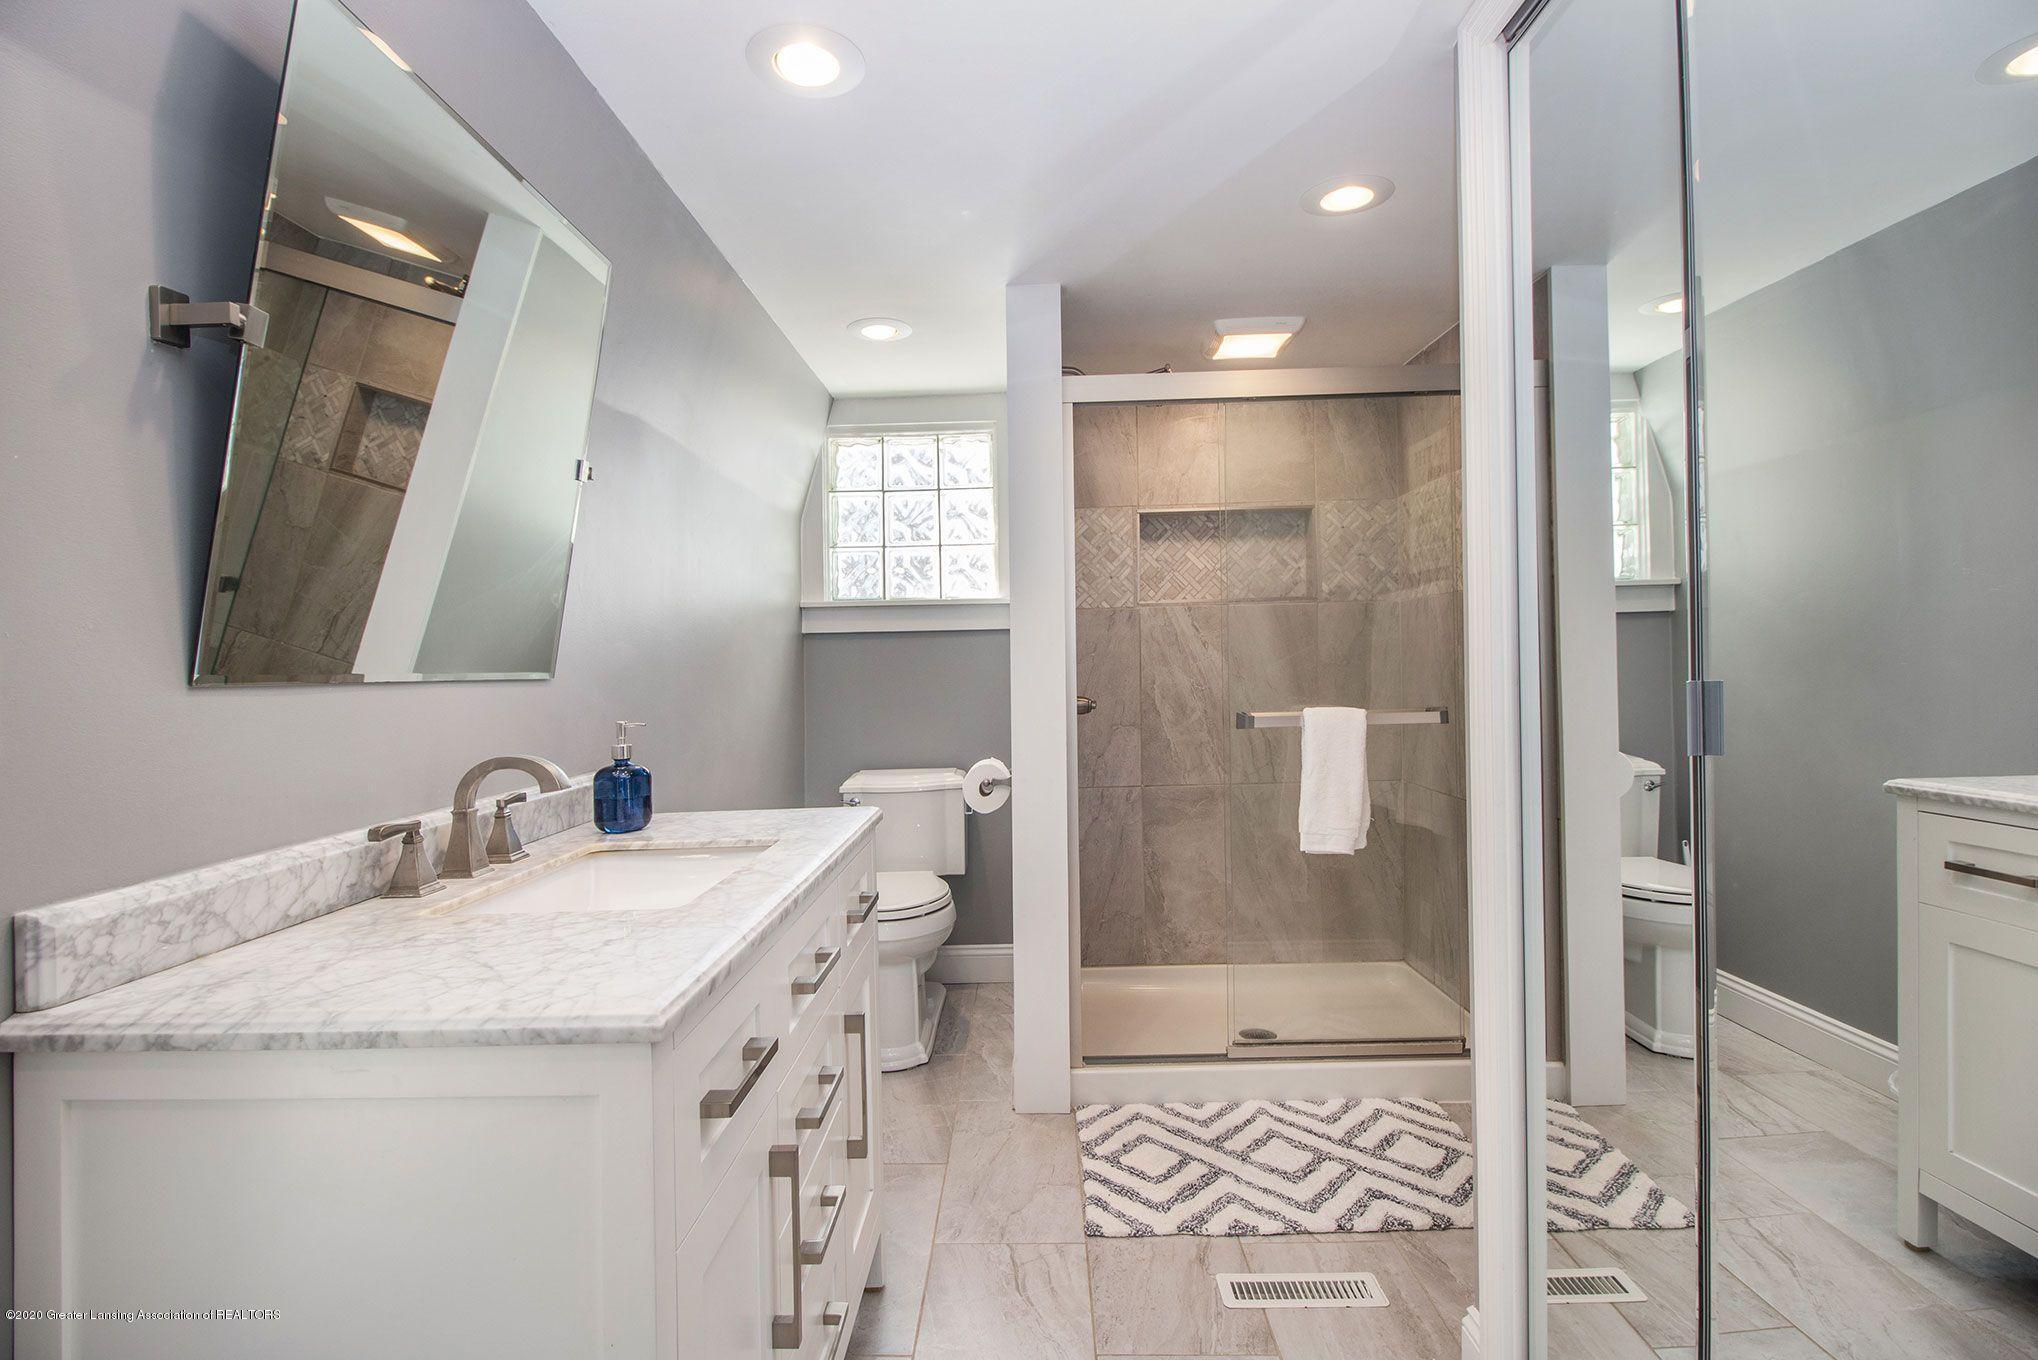 808 Water St - 2nd Floor Full Bath - 24